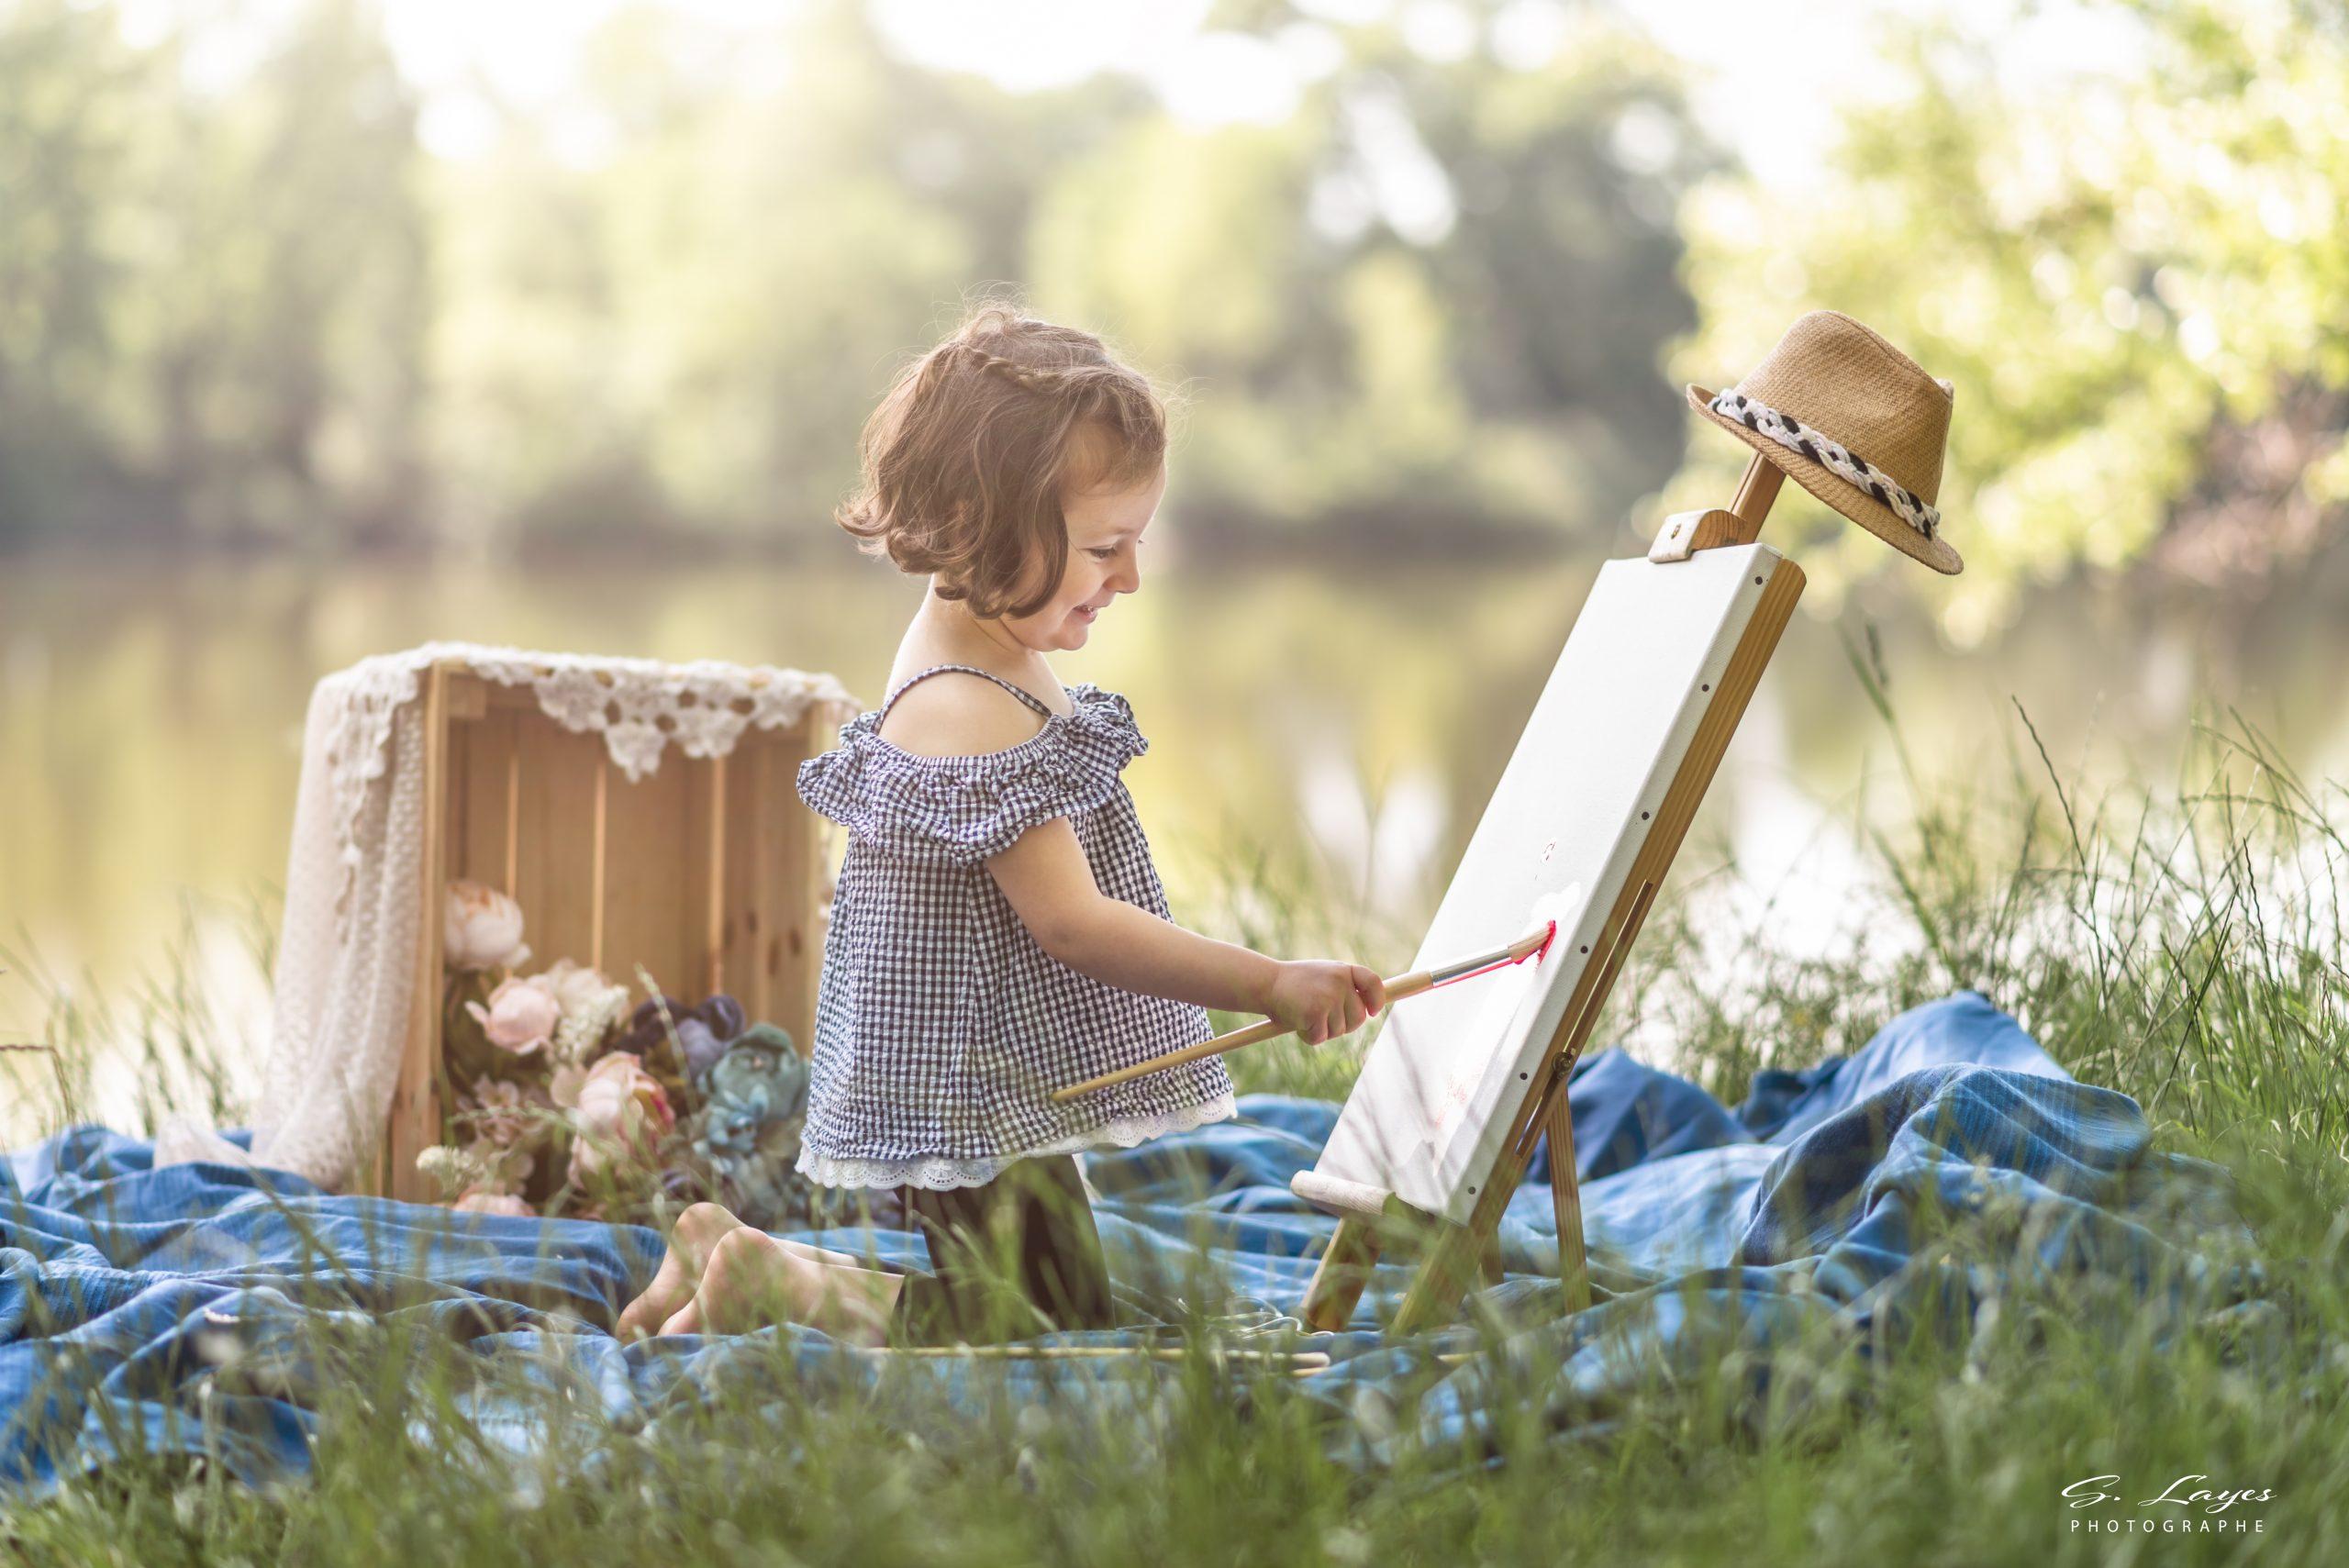 Petit artiste stephanie layes photographe